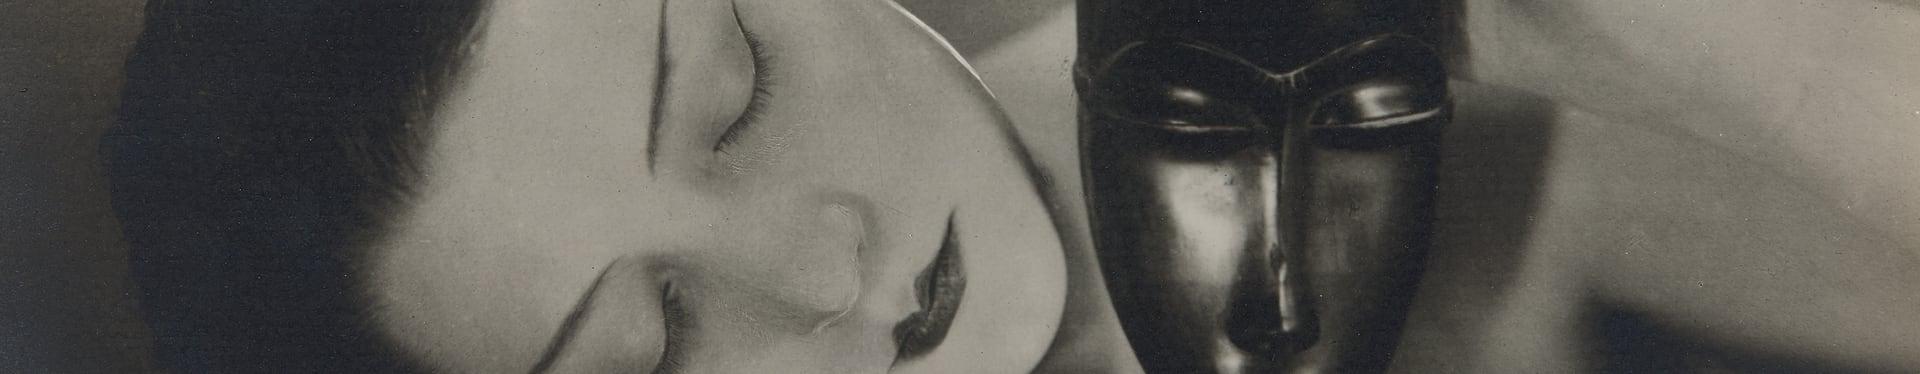 noire-et-blanche-man-ray-photographs-department-header-christies_72_1_20190312151038.jpg